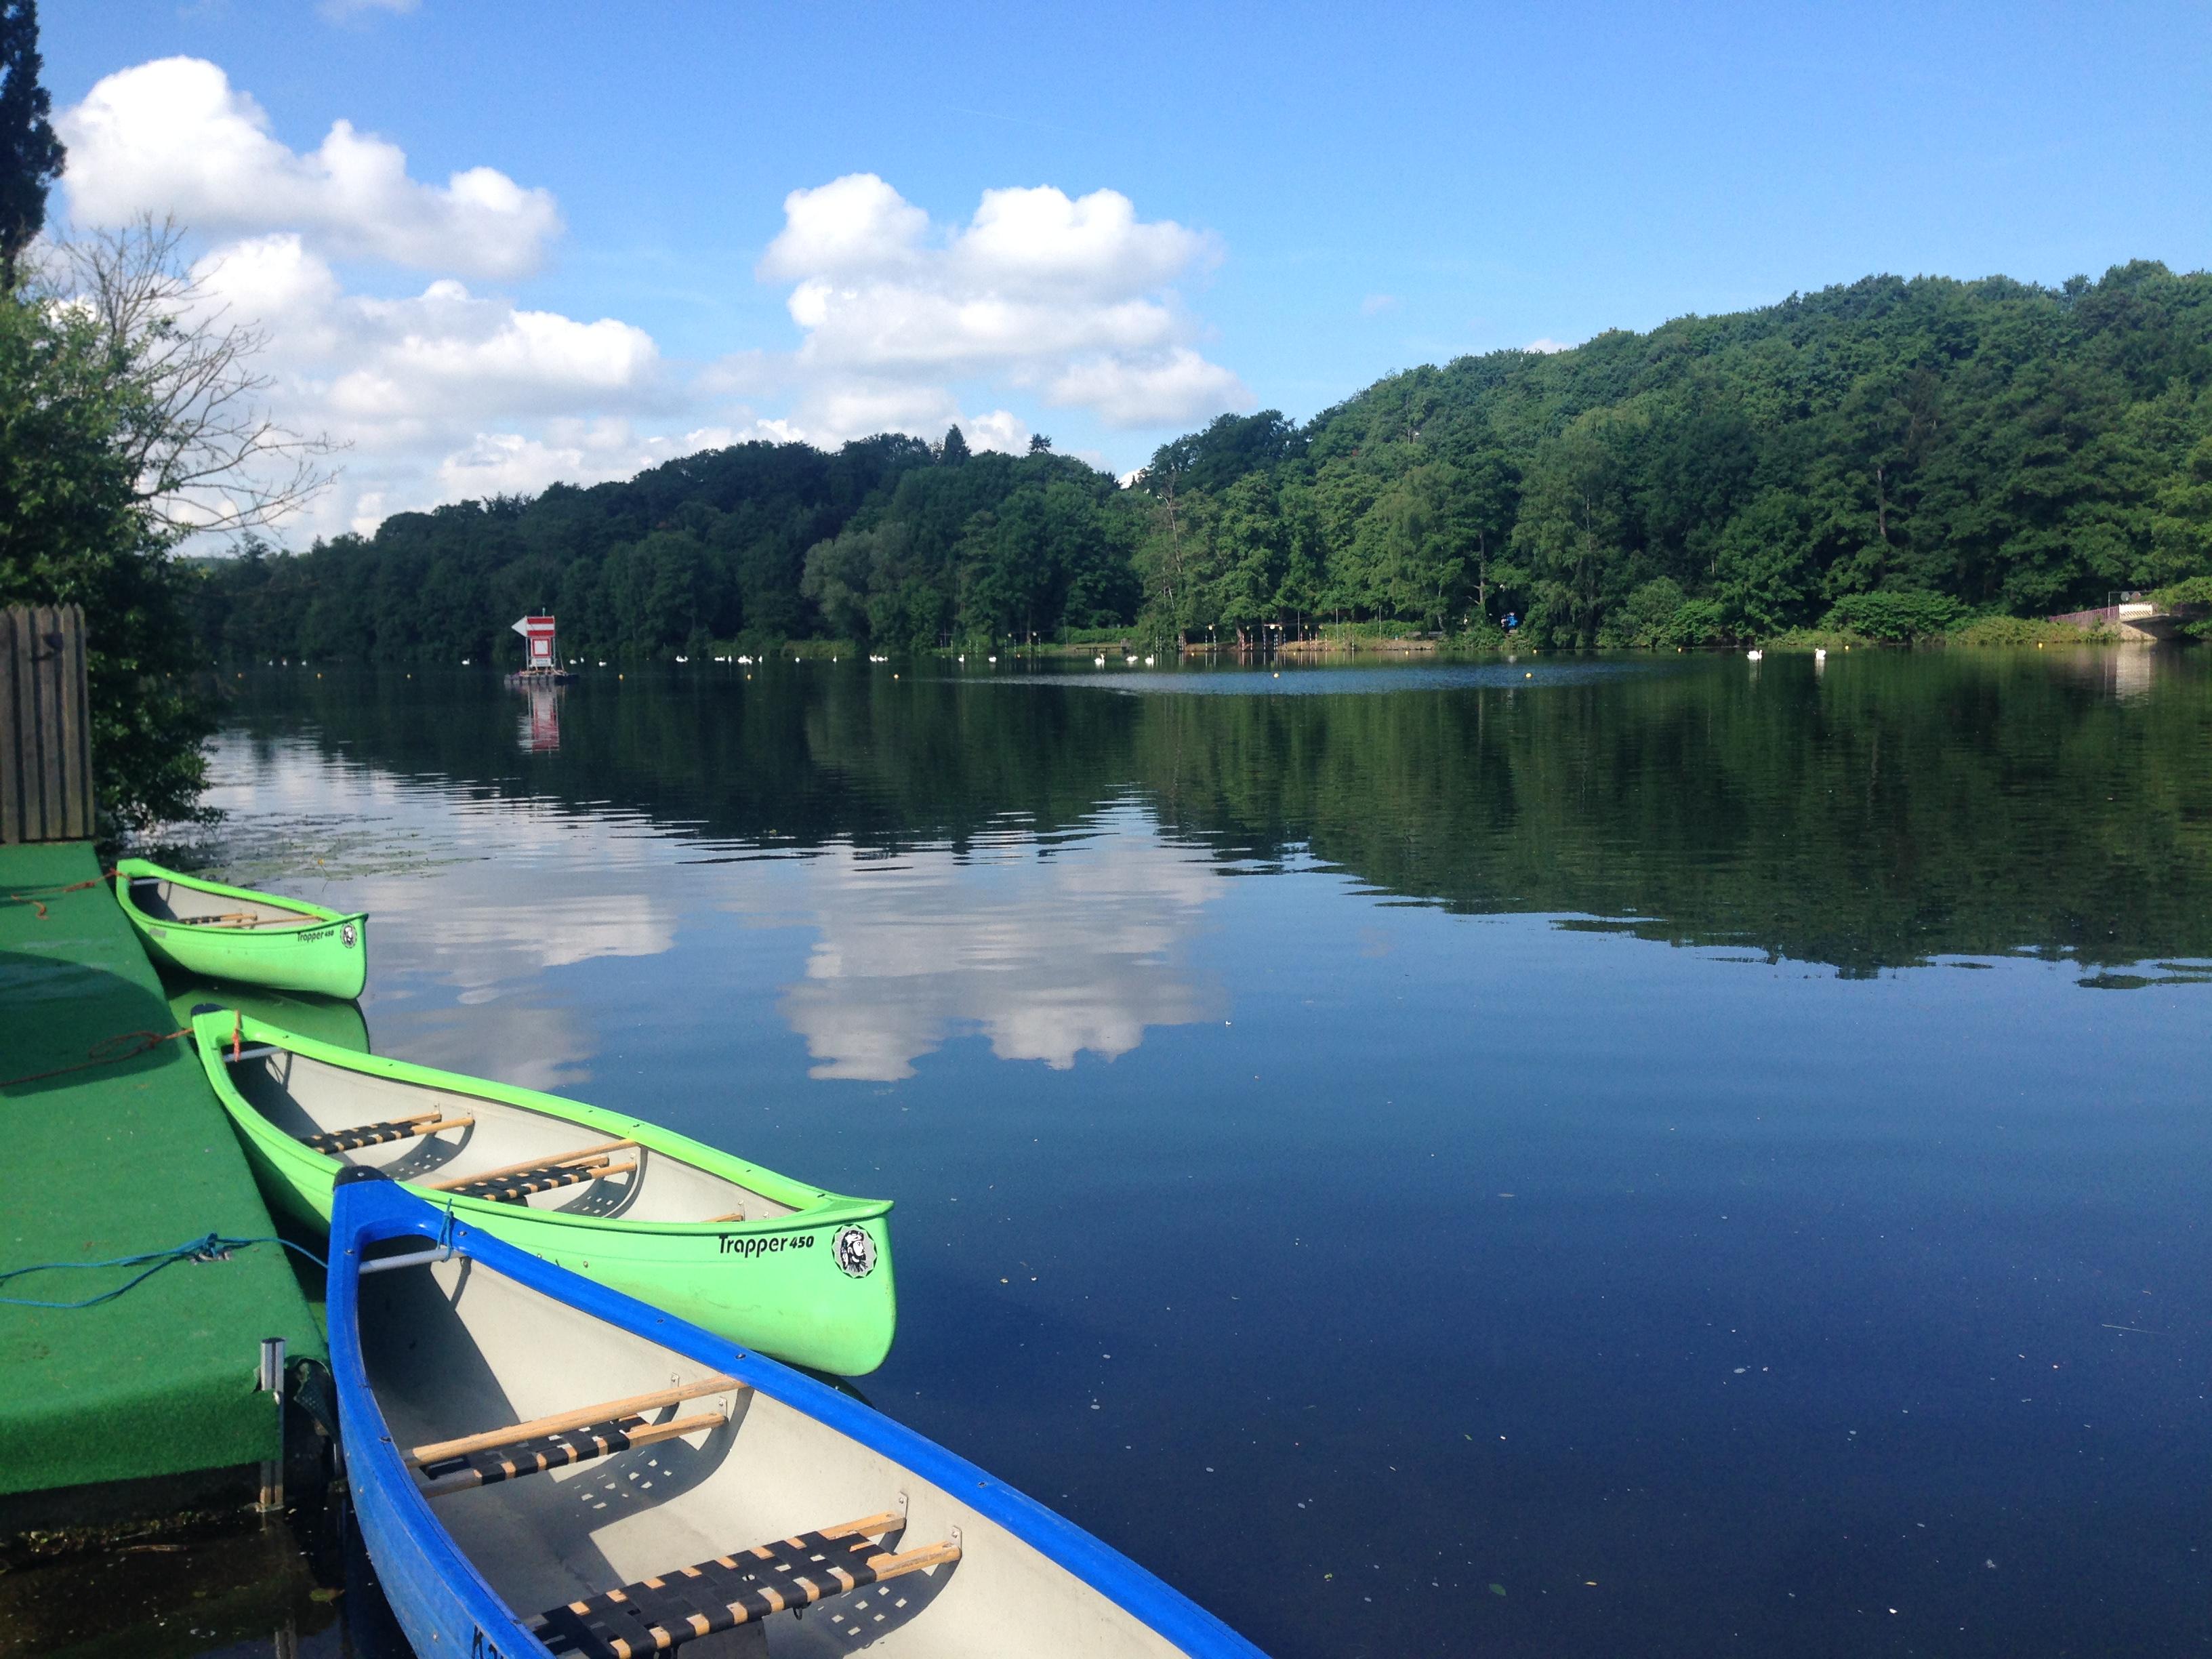 Baldeneysee Kanutouren Rafting Flosstouren Kanuschule Sup